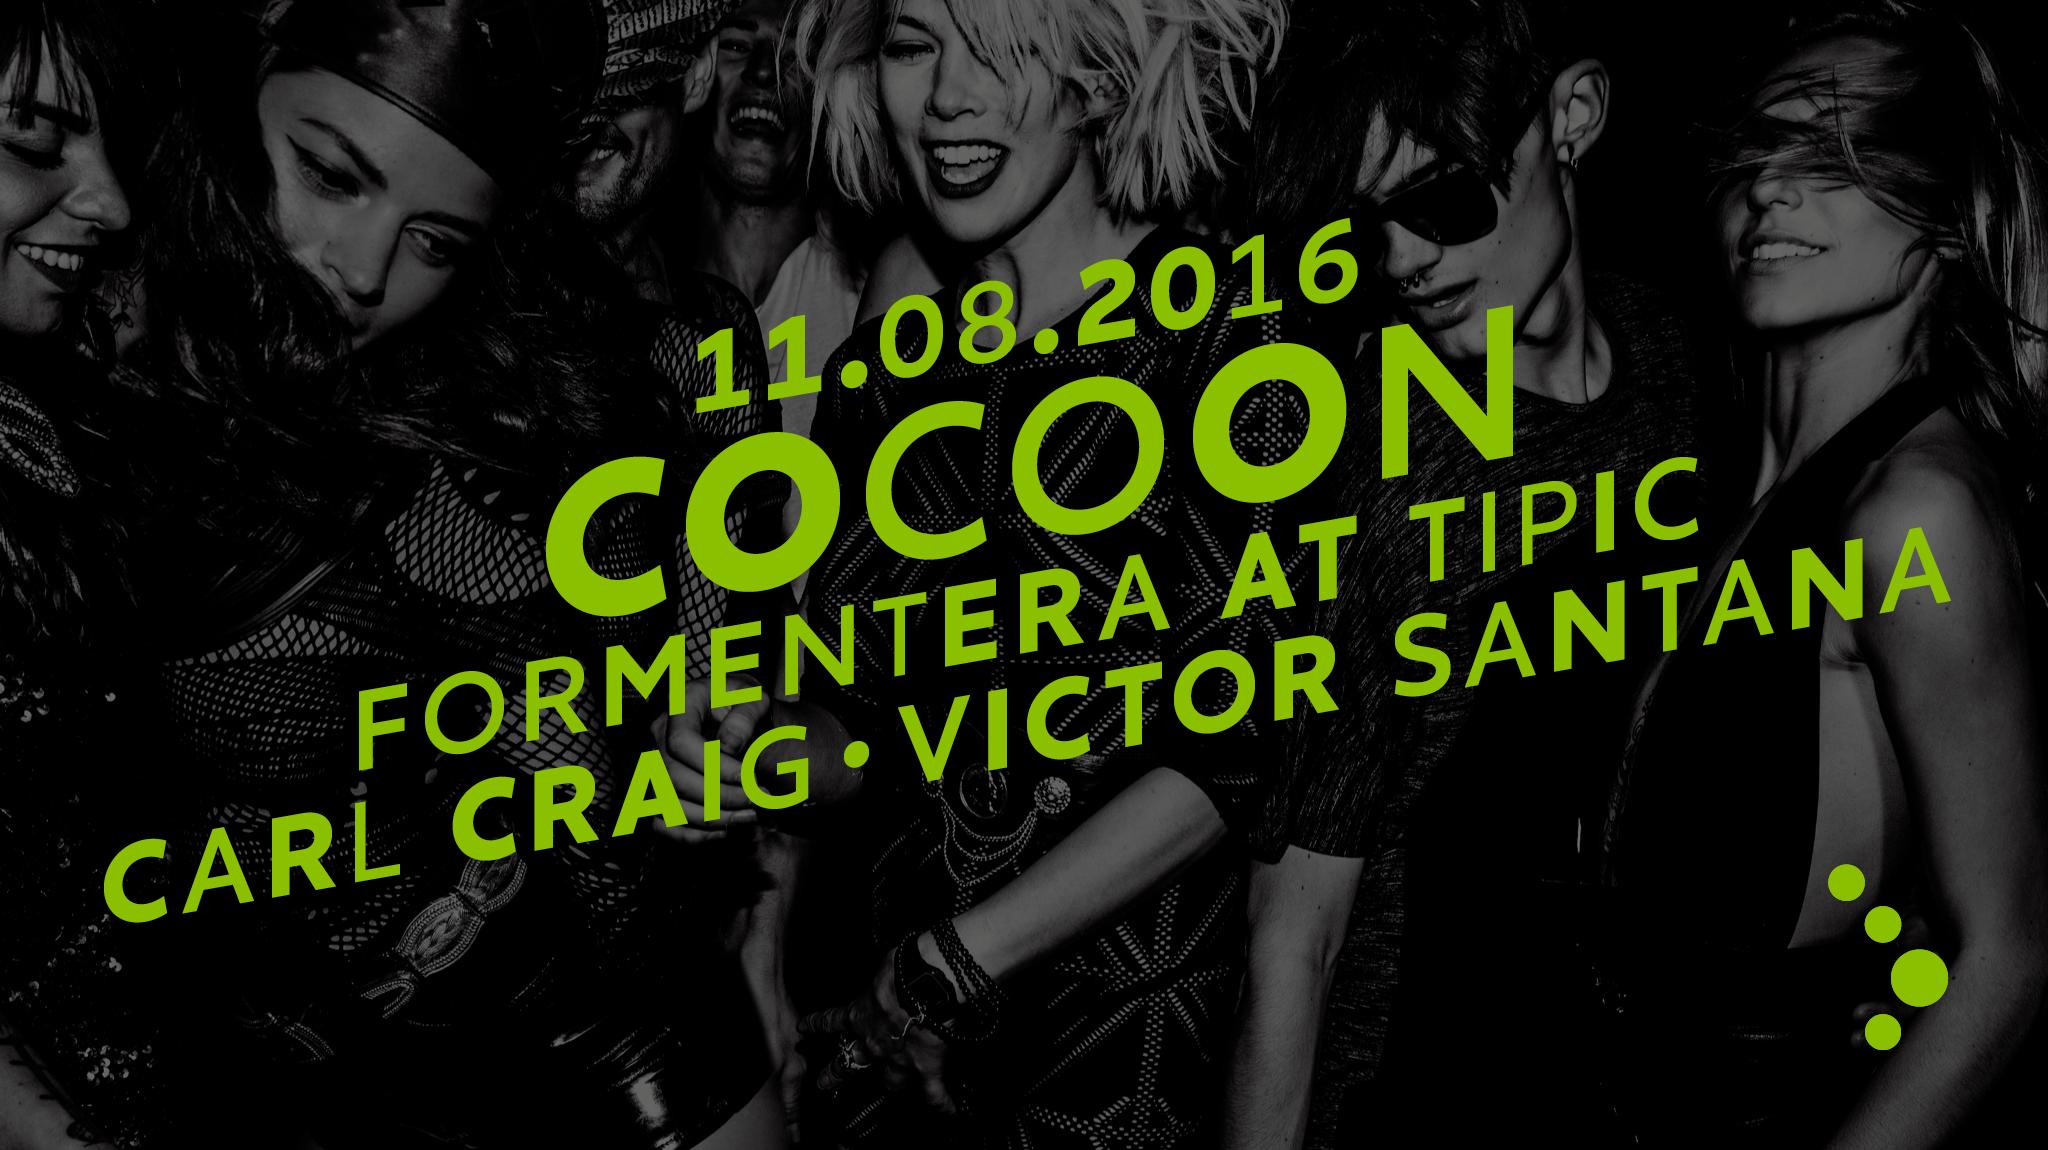 Cocoon_Formentera_2016-Events_FB_EI_2048x1152px_9